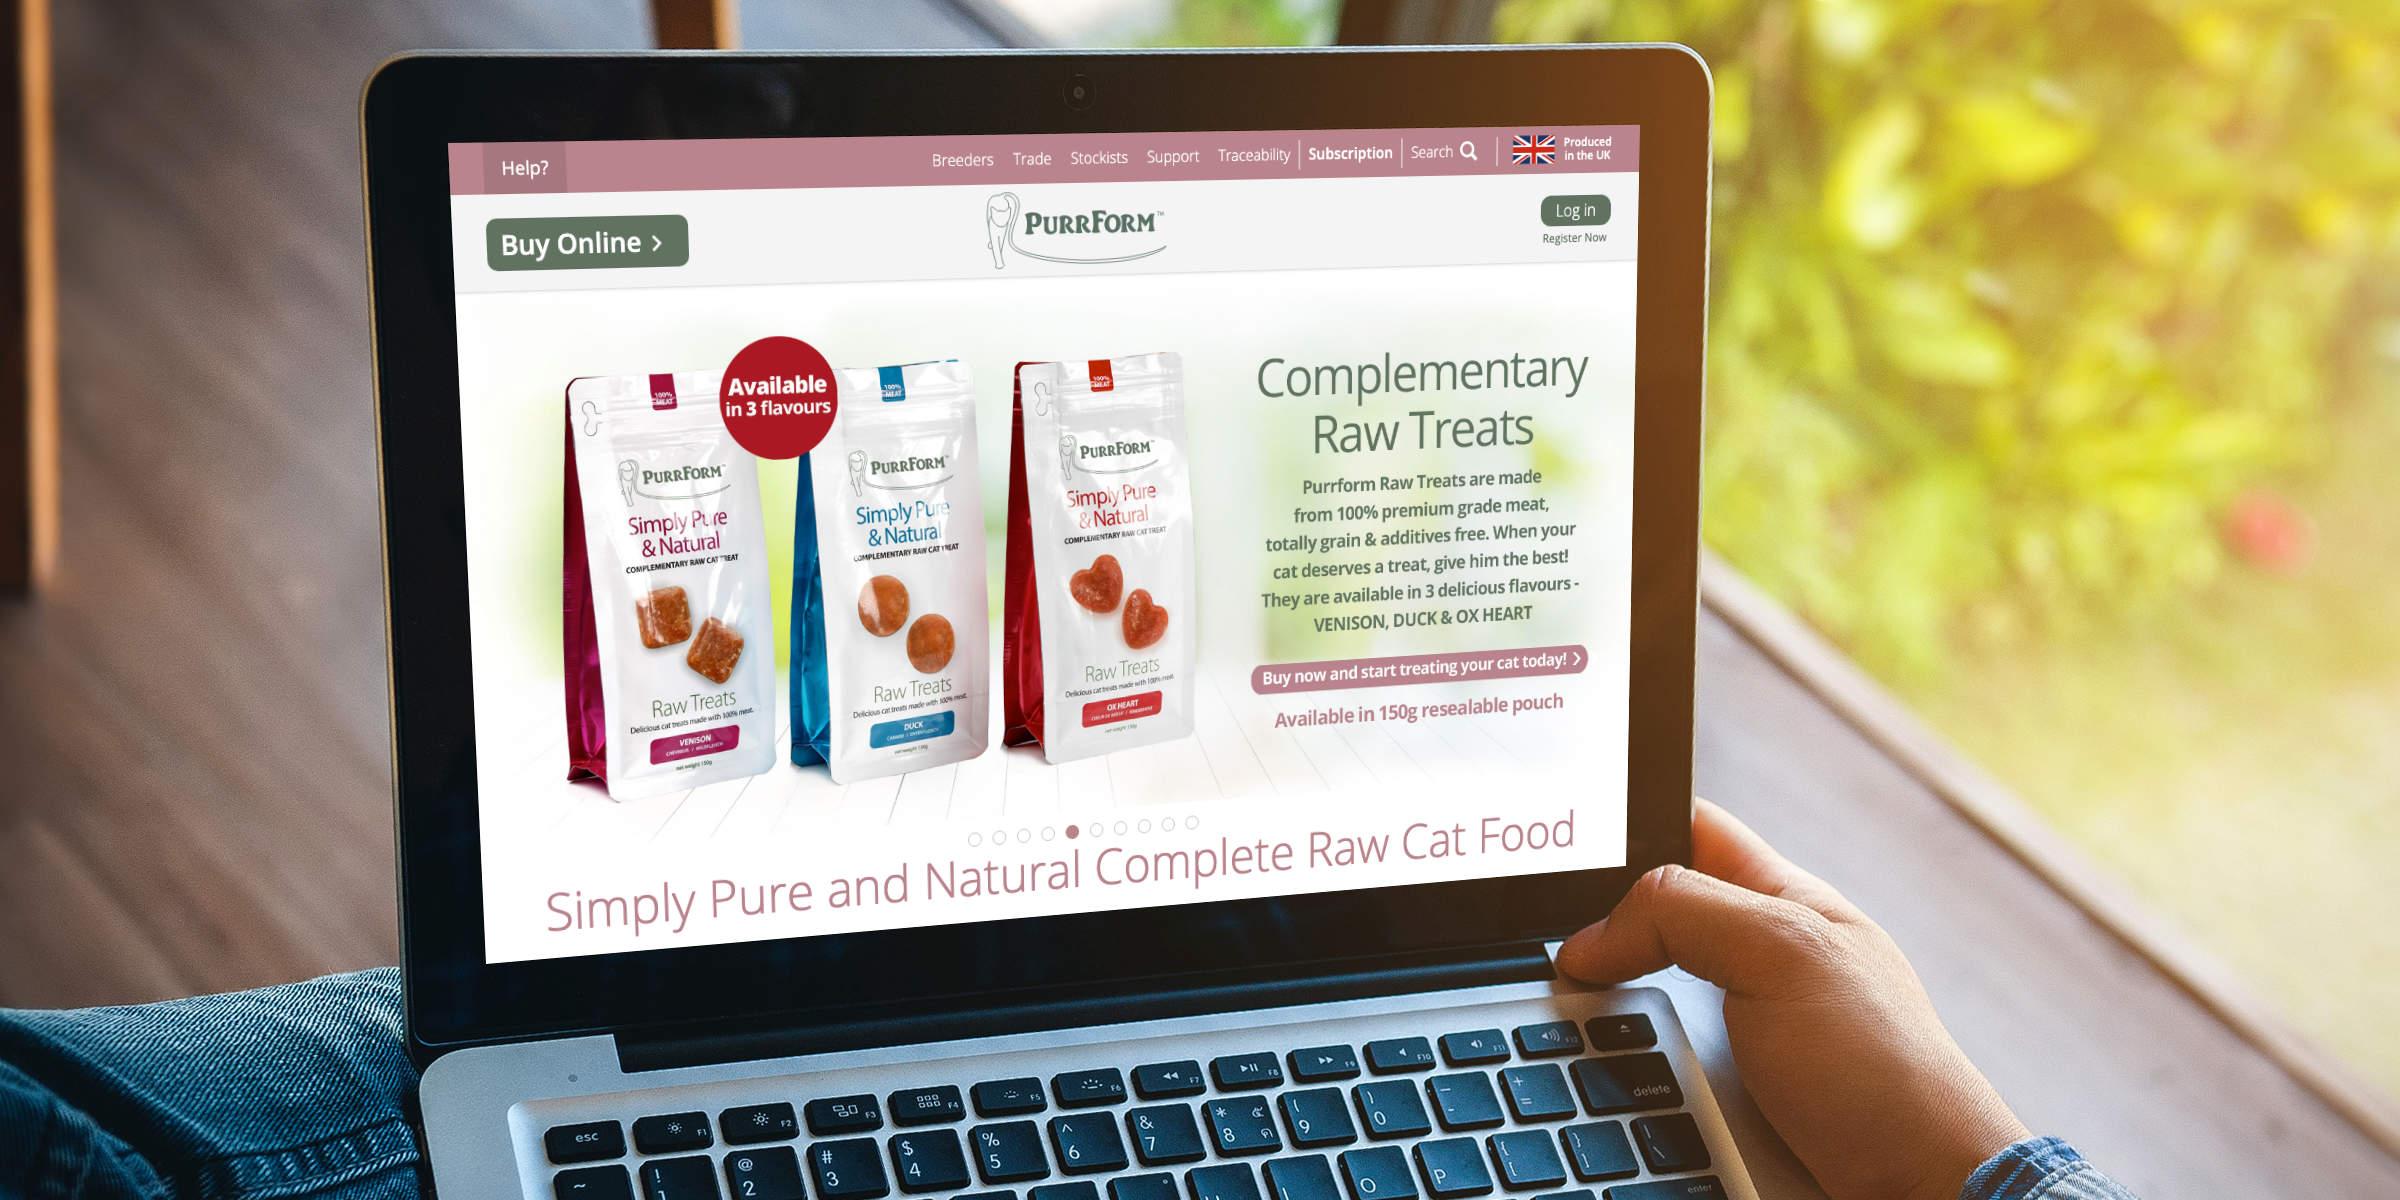 purrform raw cat food website design